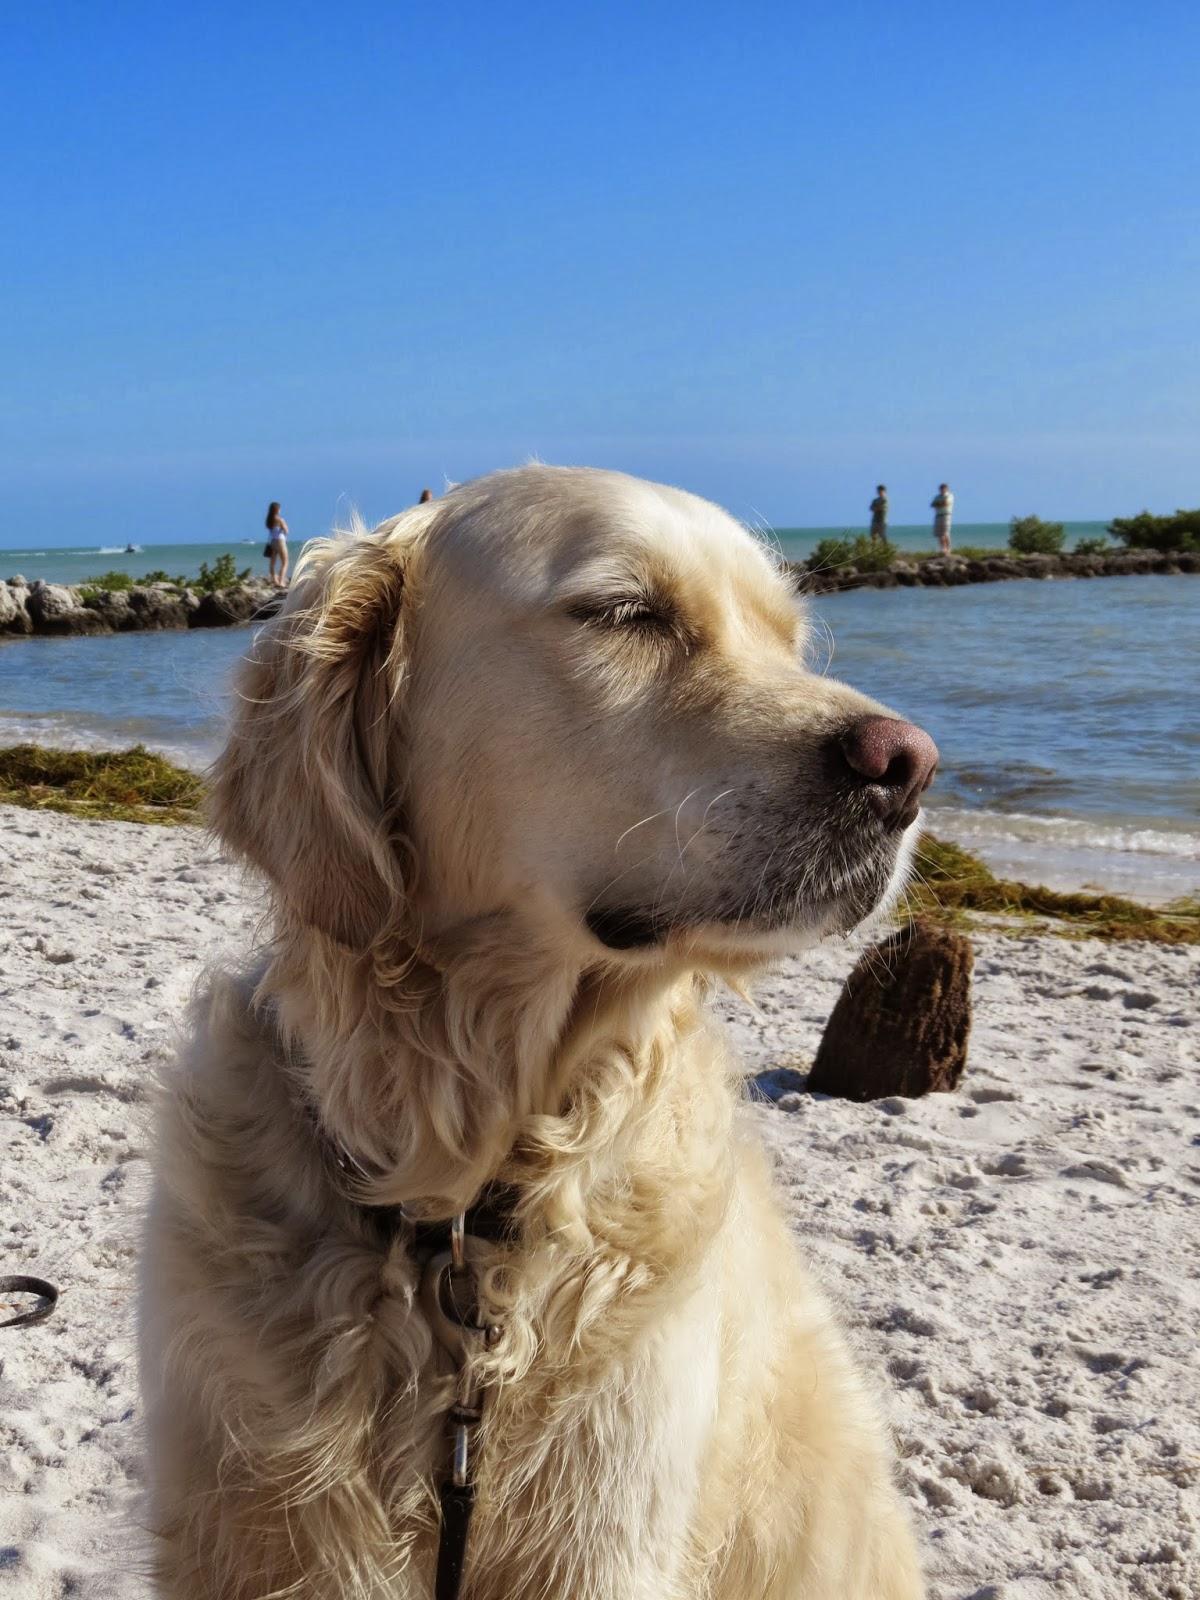 Boris the Golden Retriever enjoying the beach in Key West